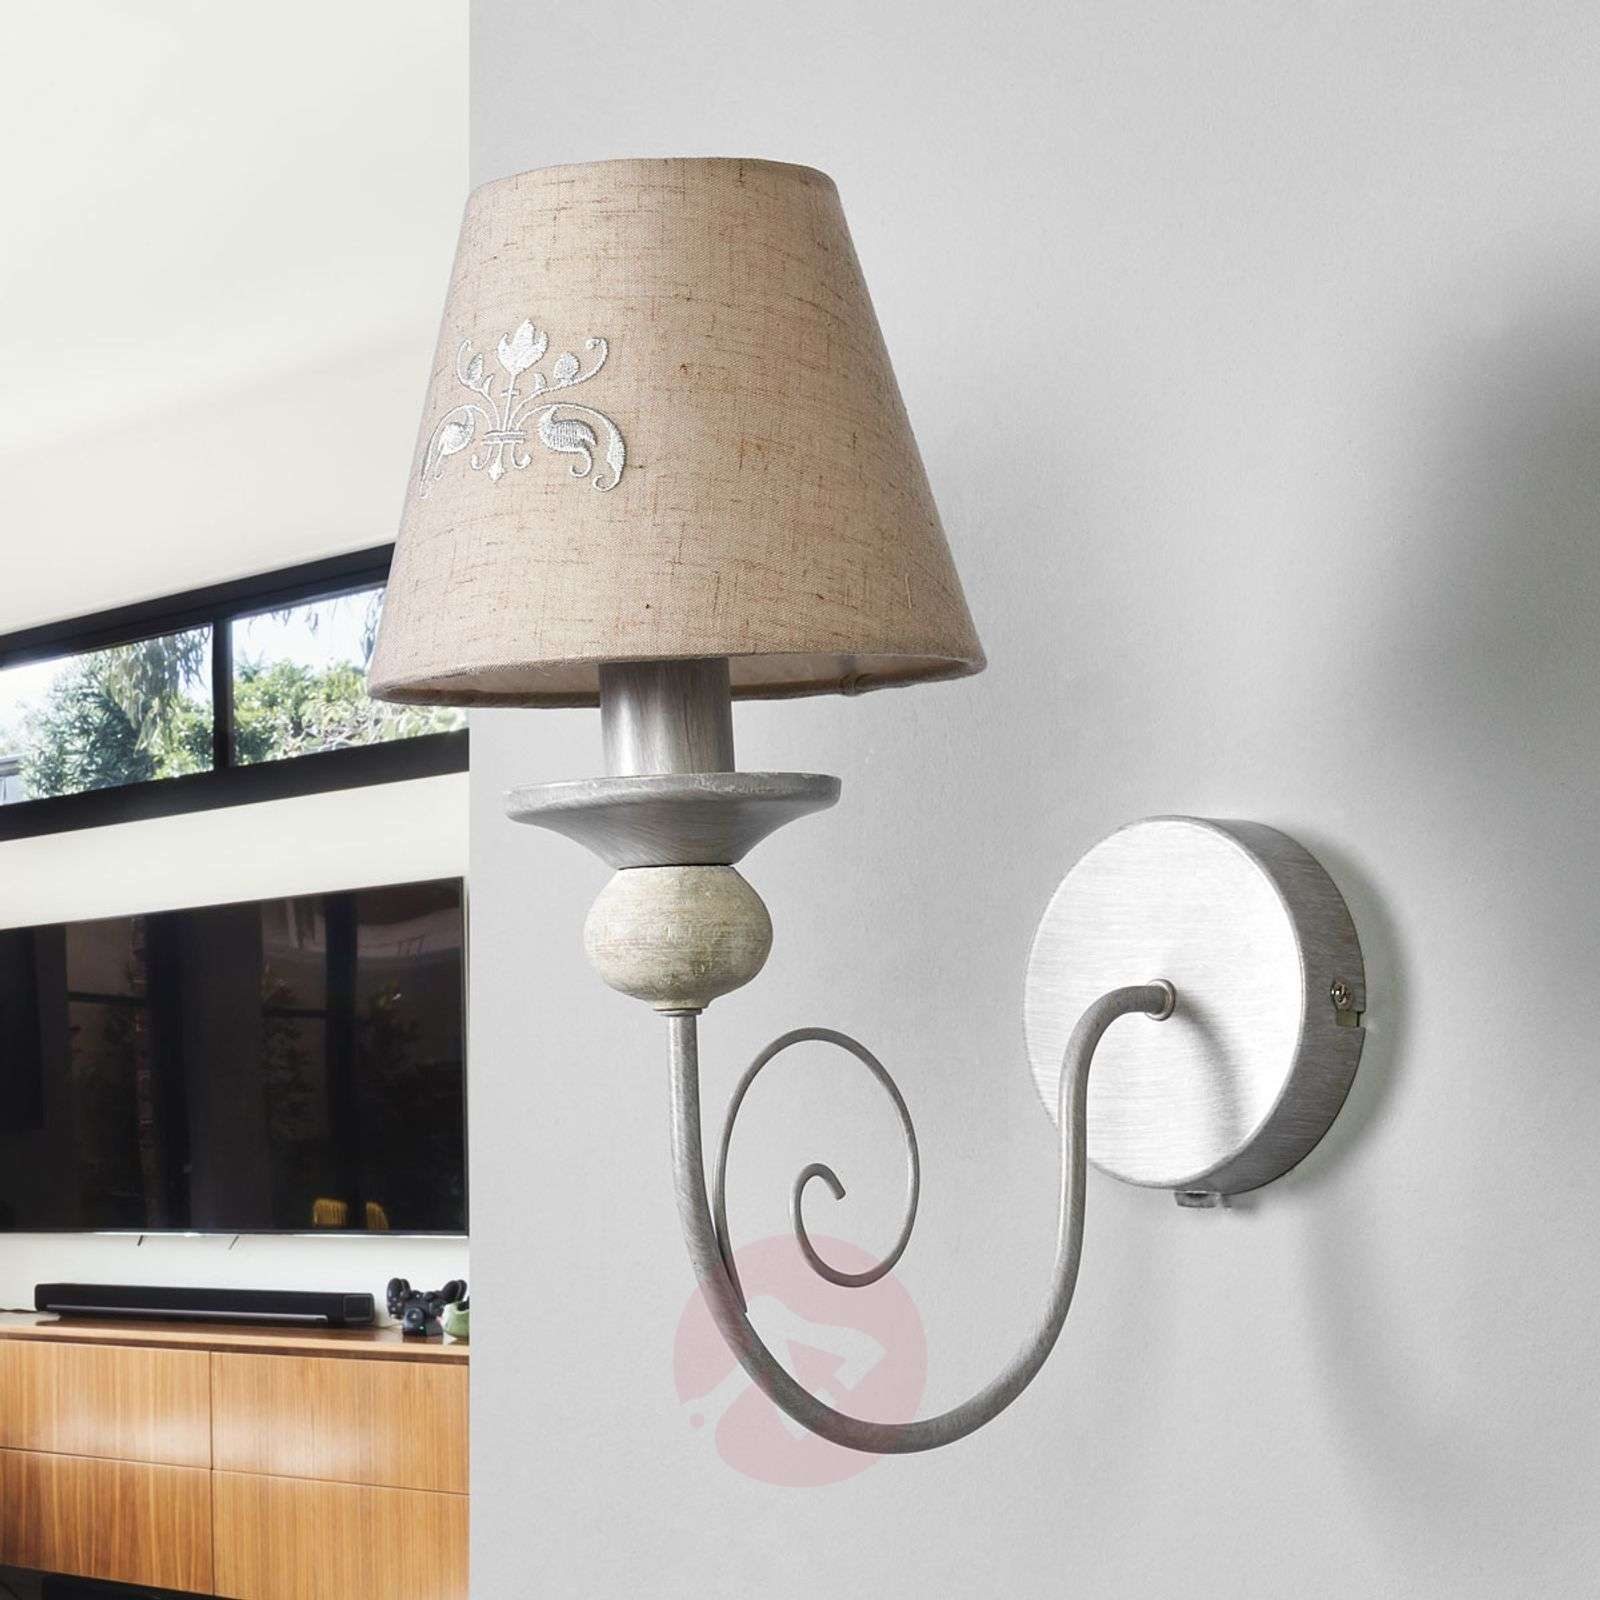 Spirited Robin fabric wall light-6055077-01